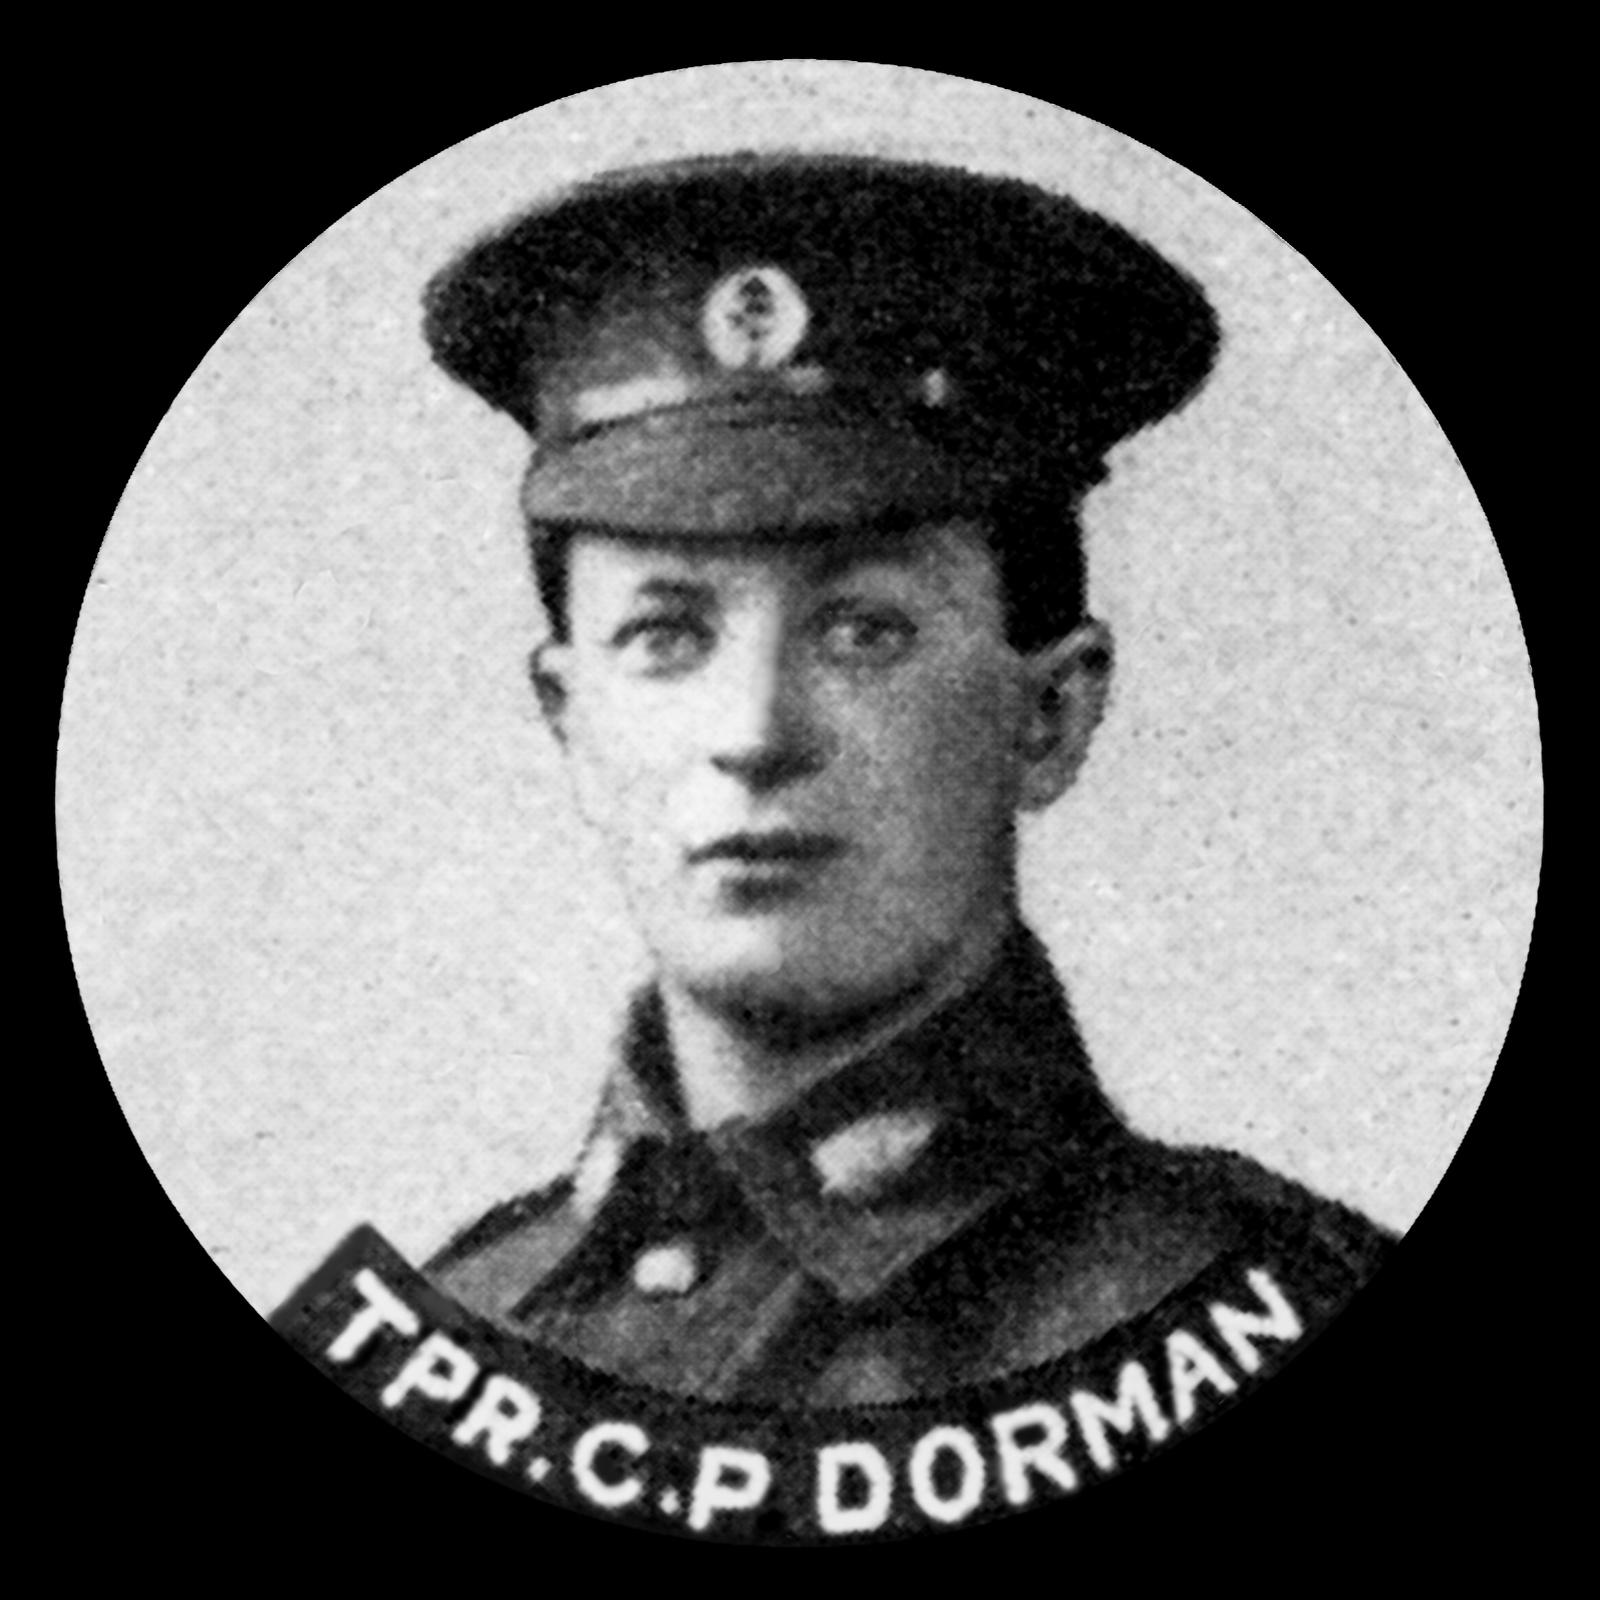 DORMAN Charles Percy